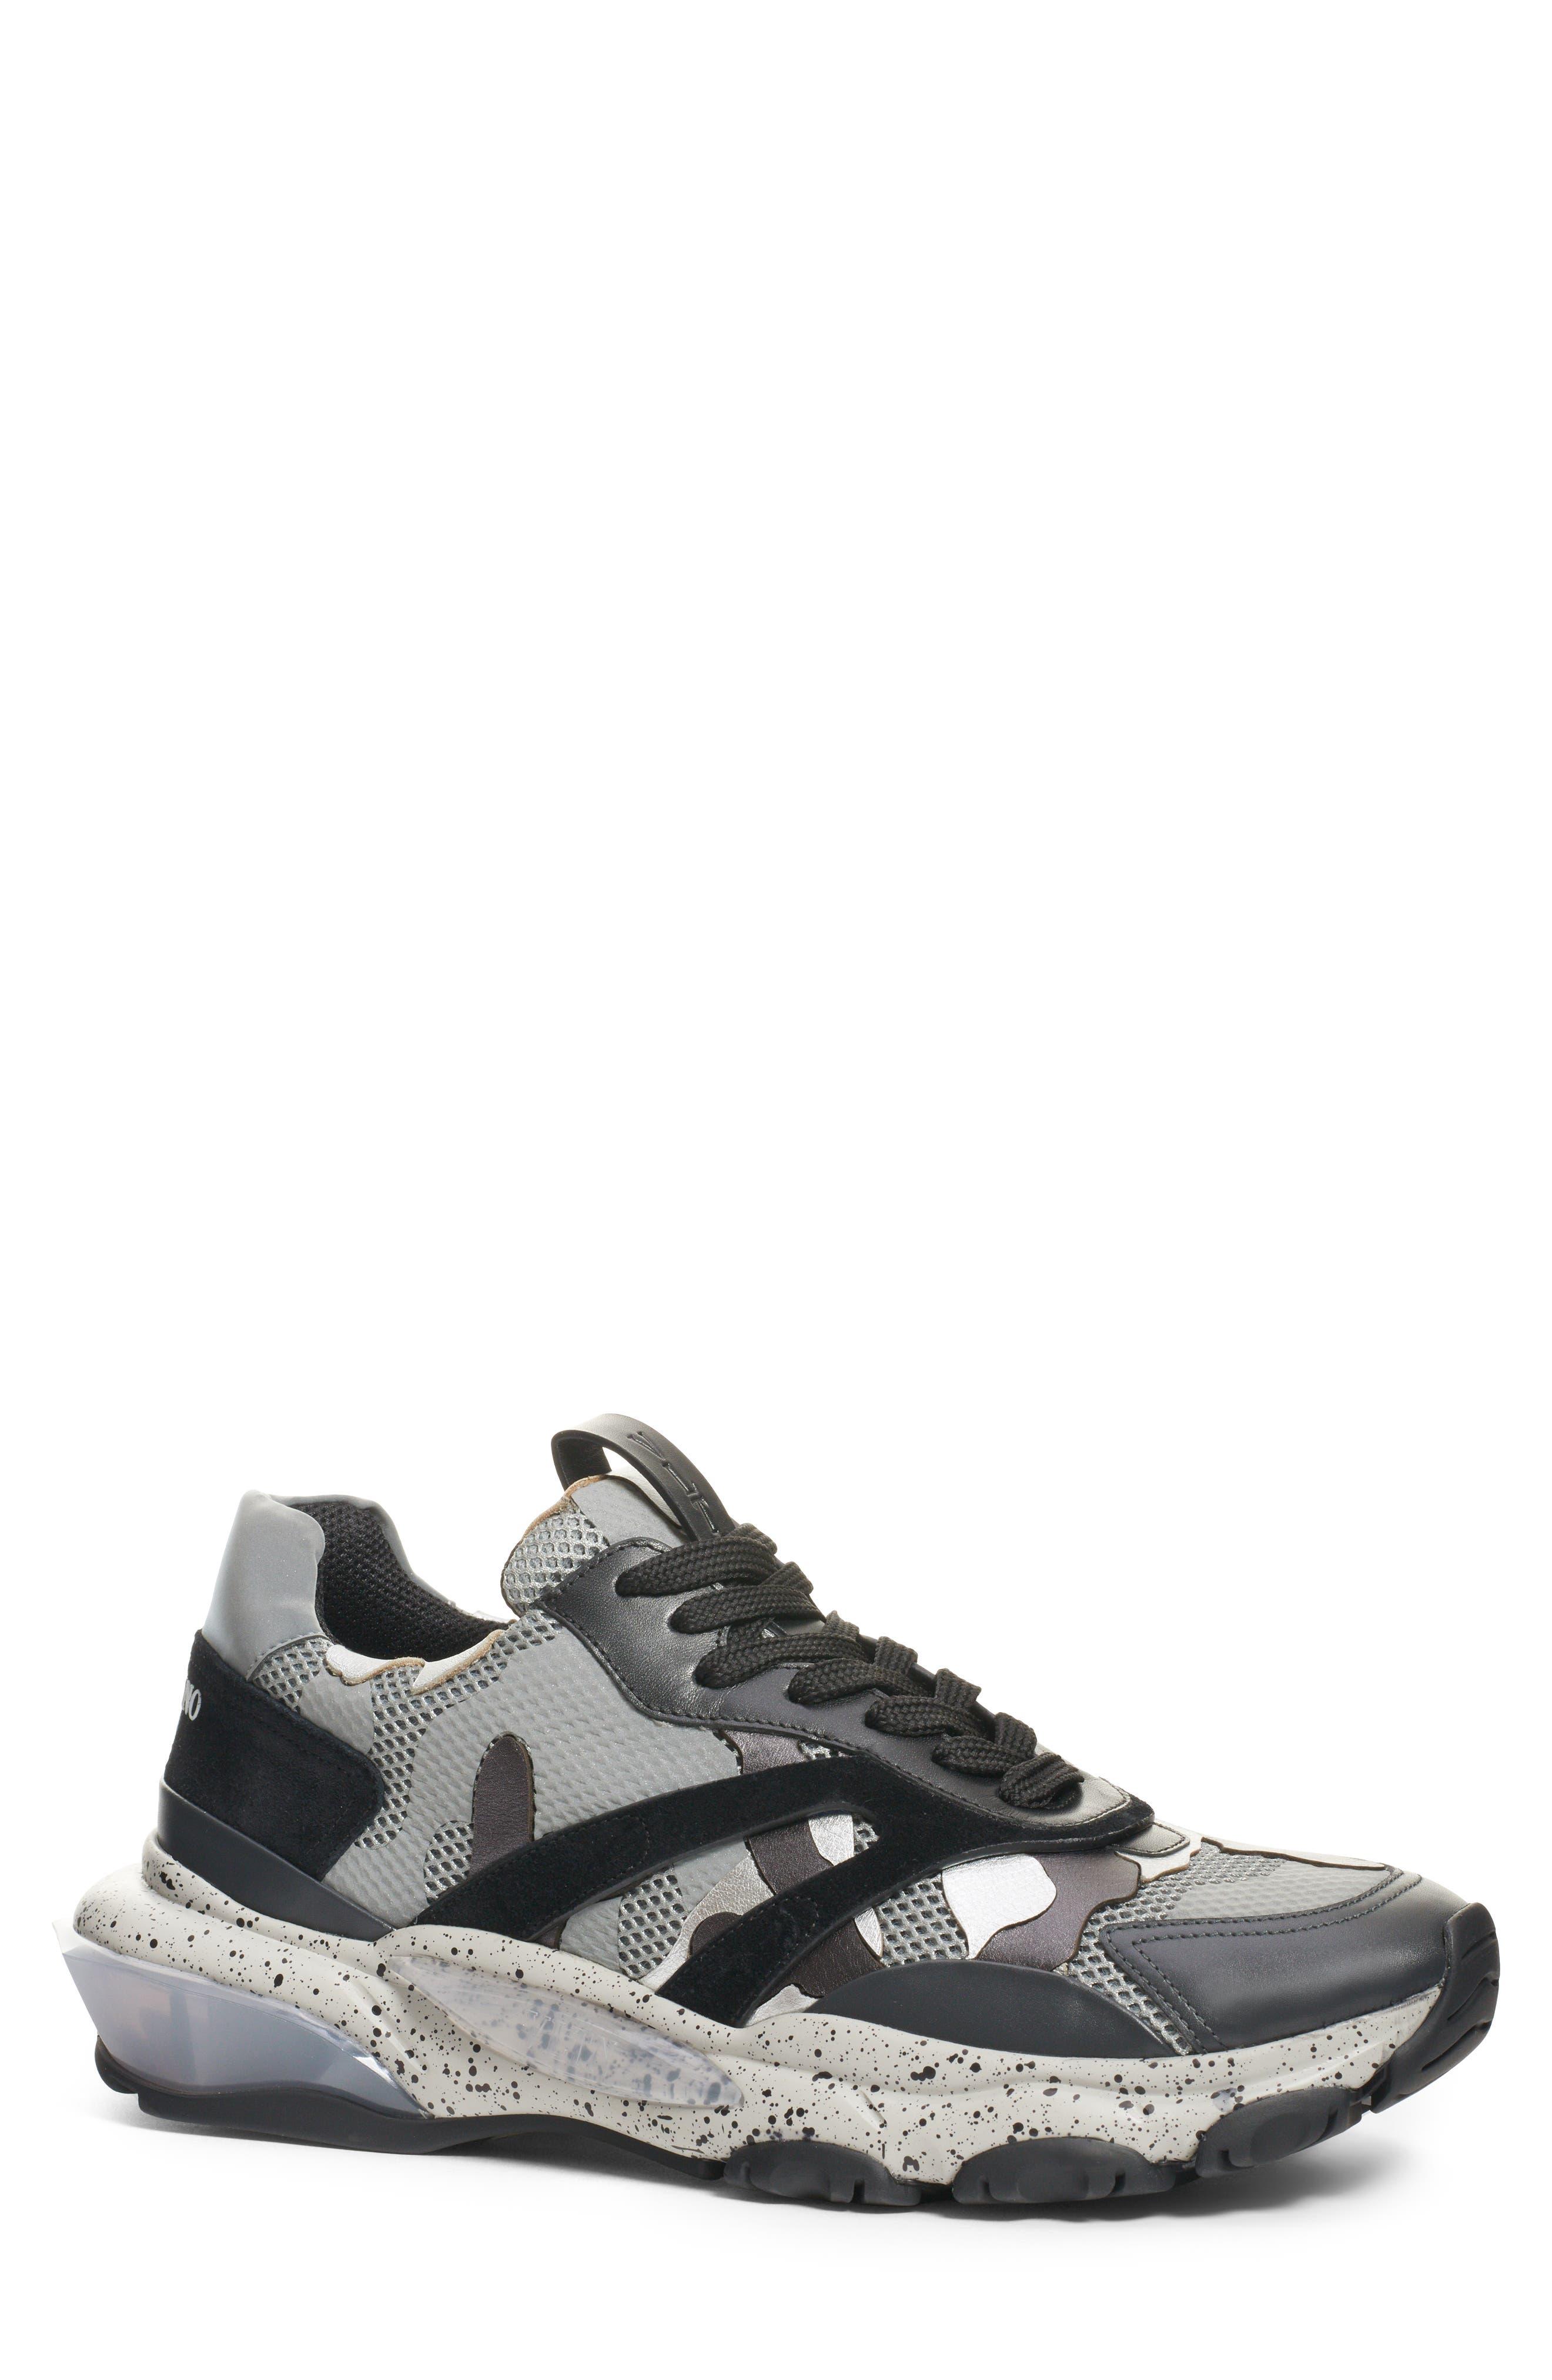 Bounce Sneaker,                             Main thumbnail 1, color,                             DARK SILVER/ BLACK